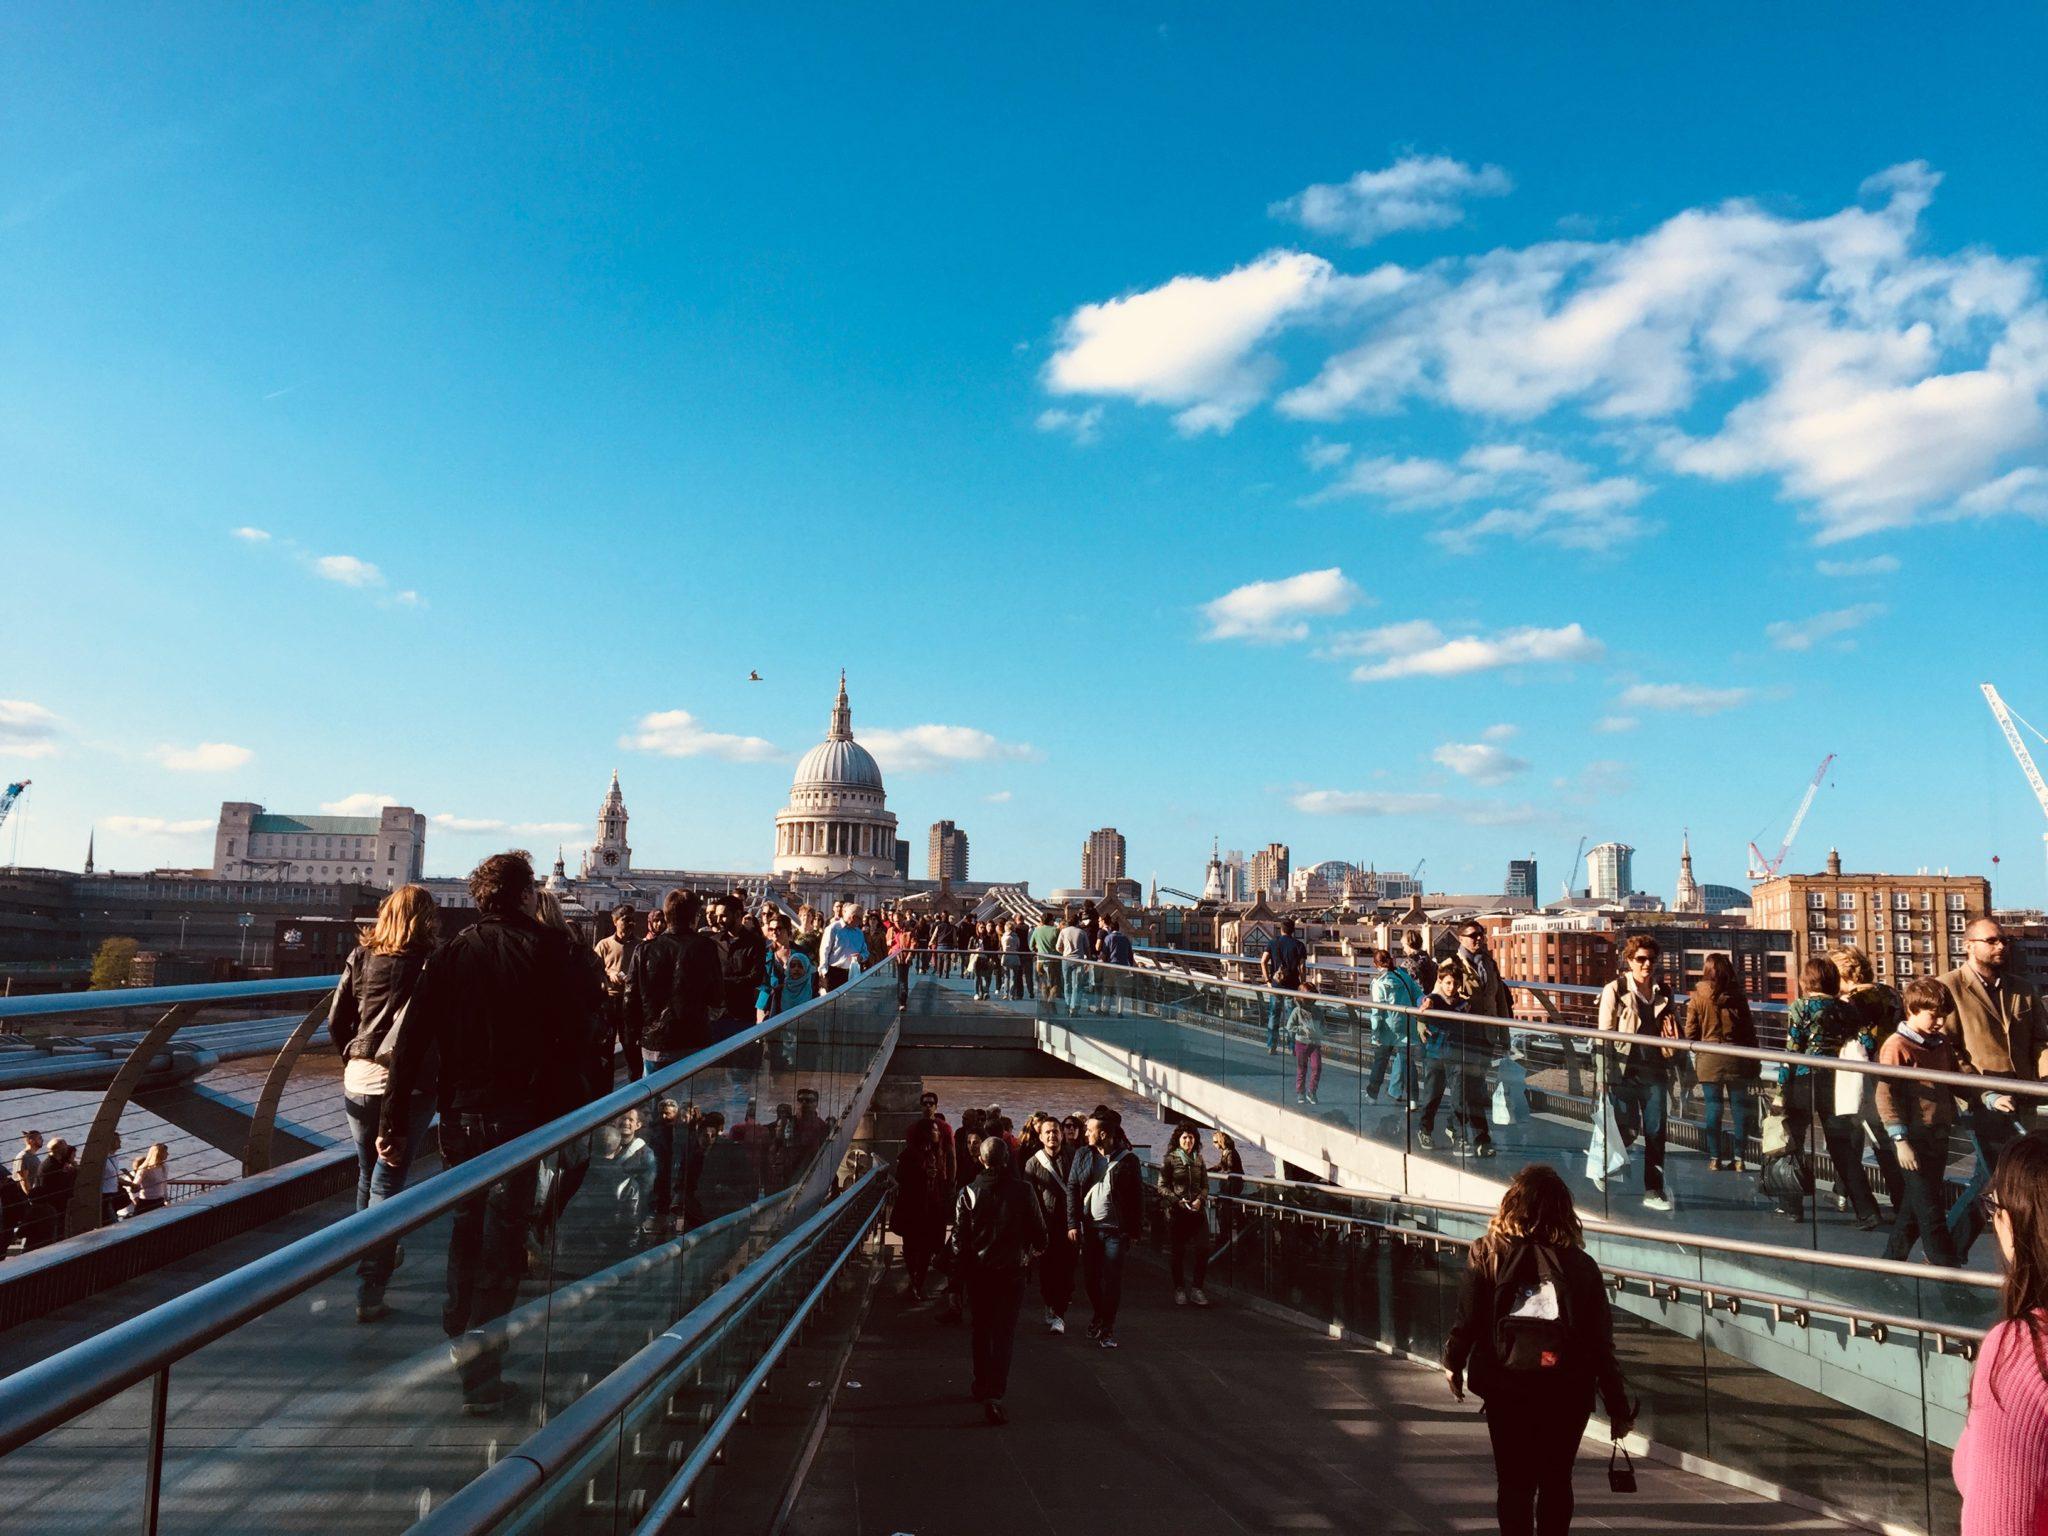 Kładka widokowa Millenium Bridge